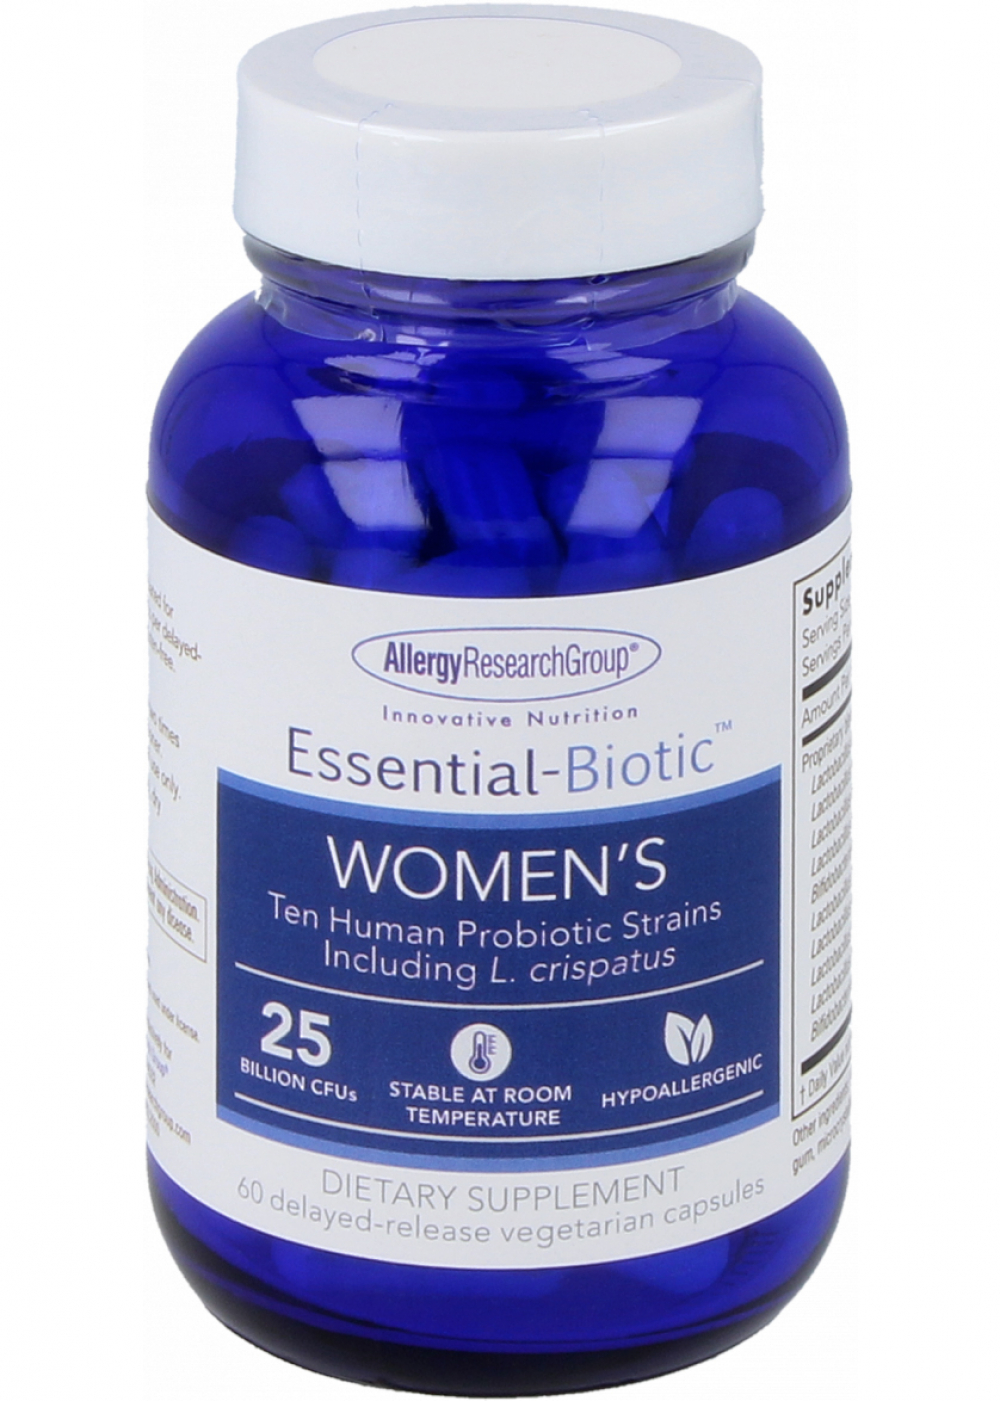 Allergy Research Group Essential-Biotic Womens 60 veg. Kapseln